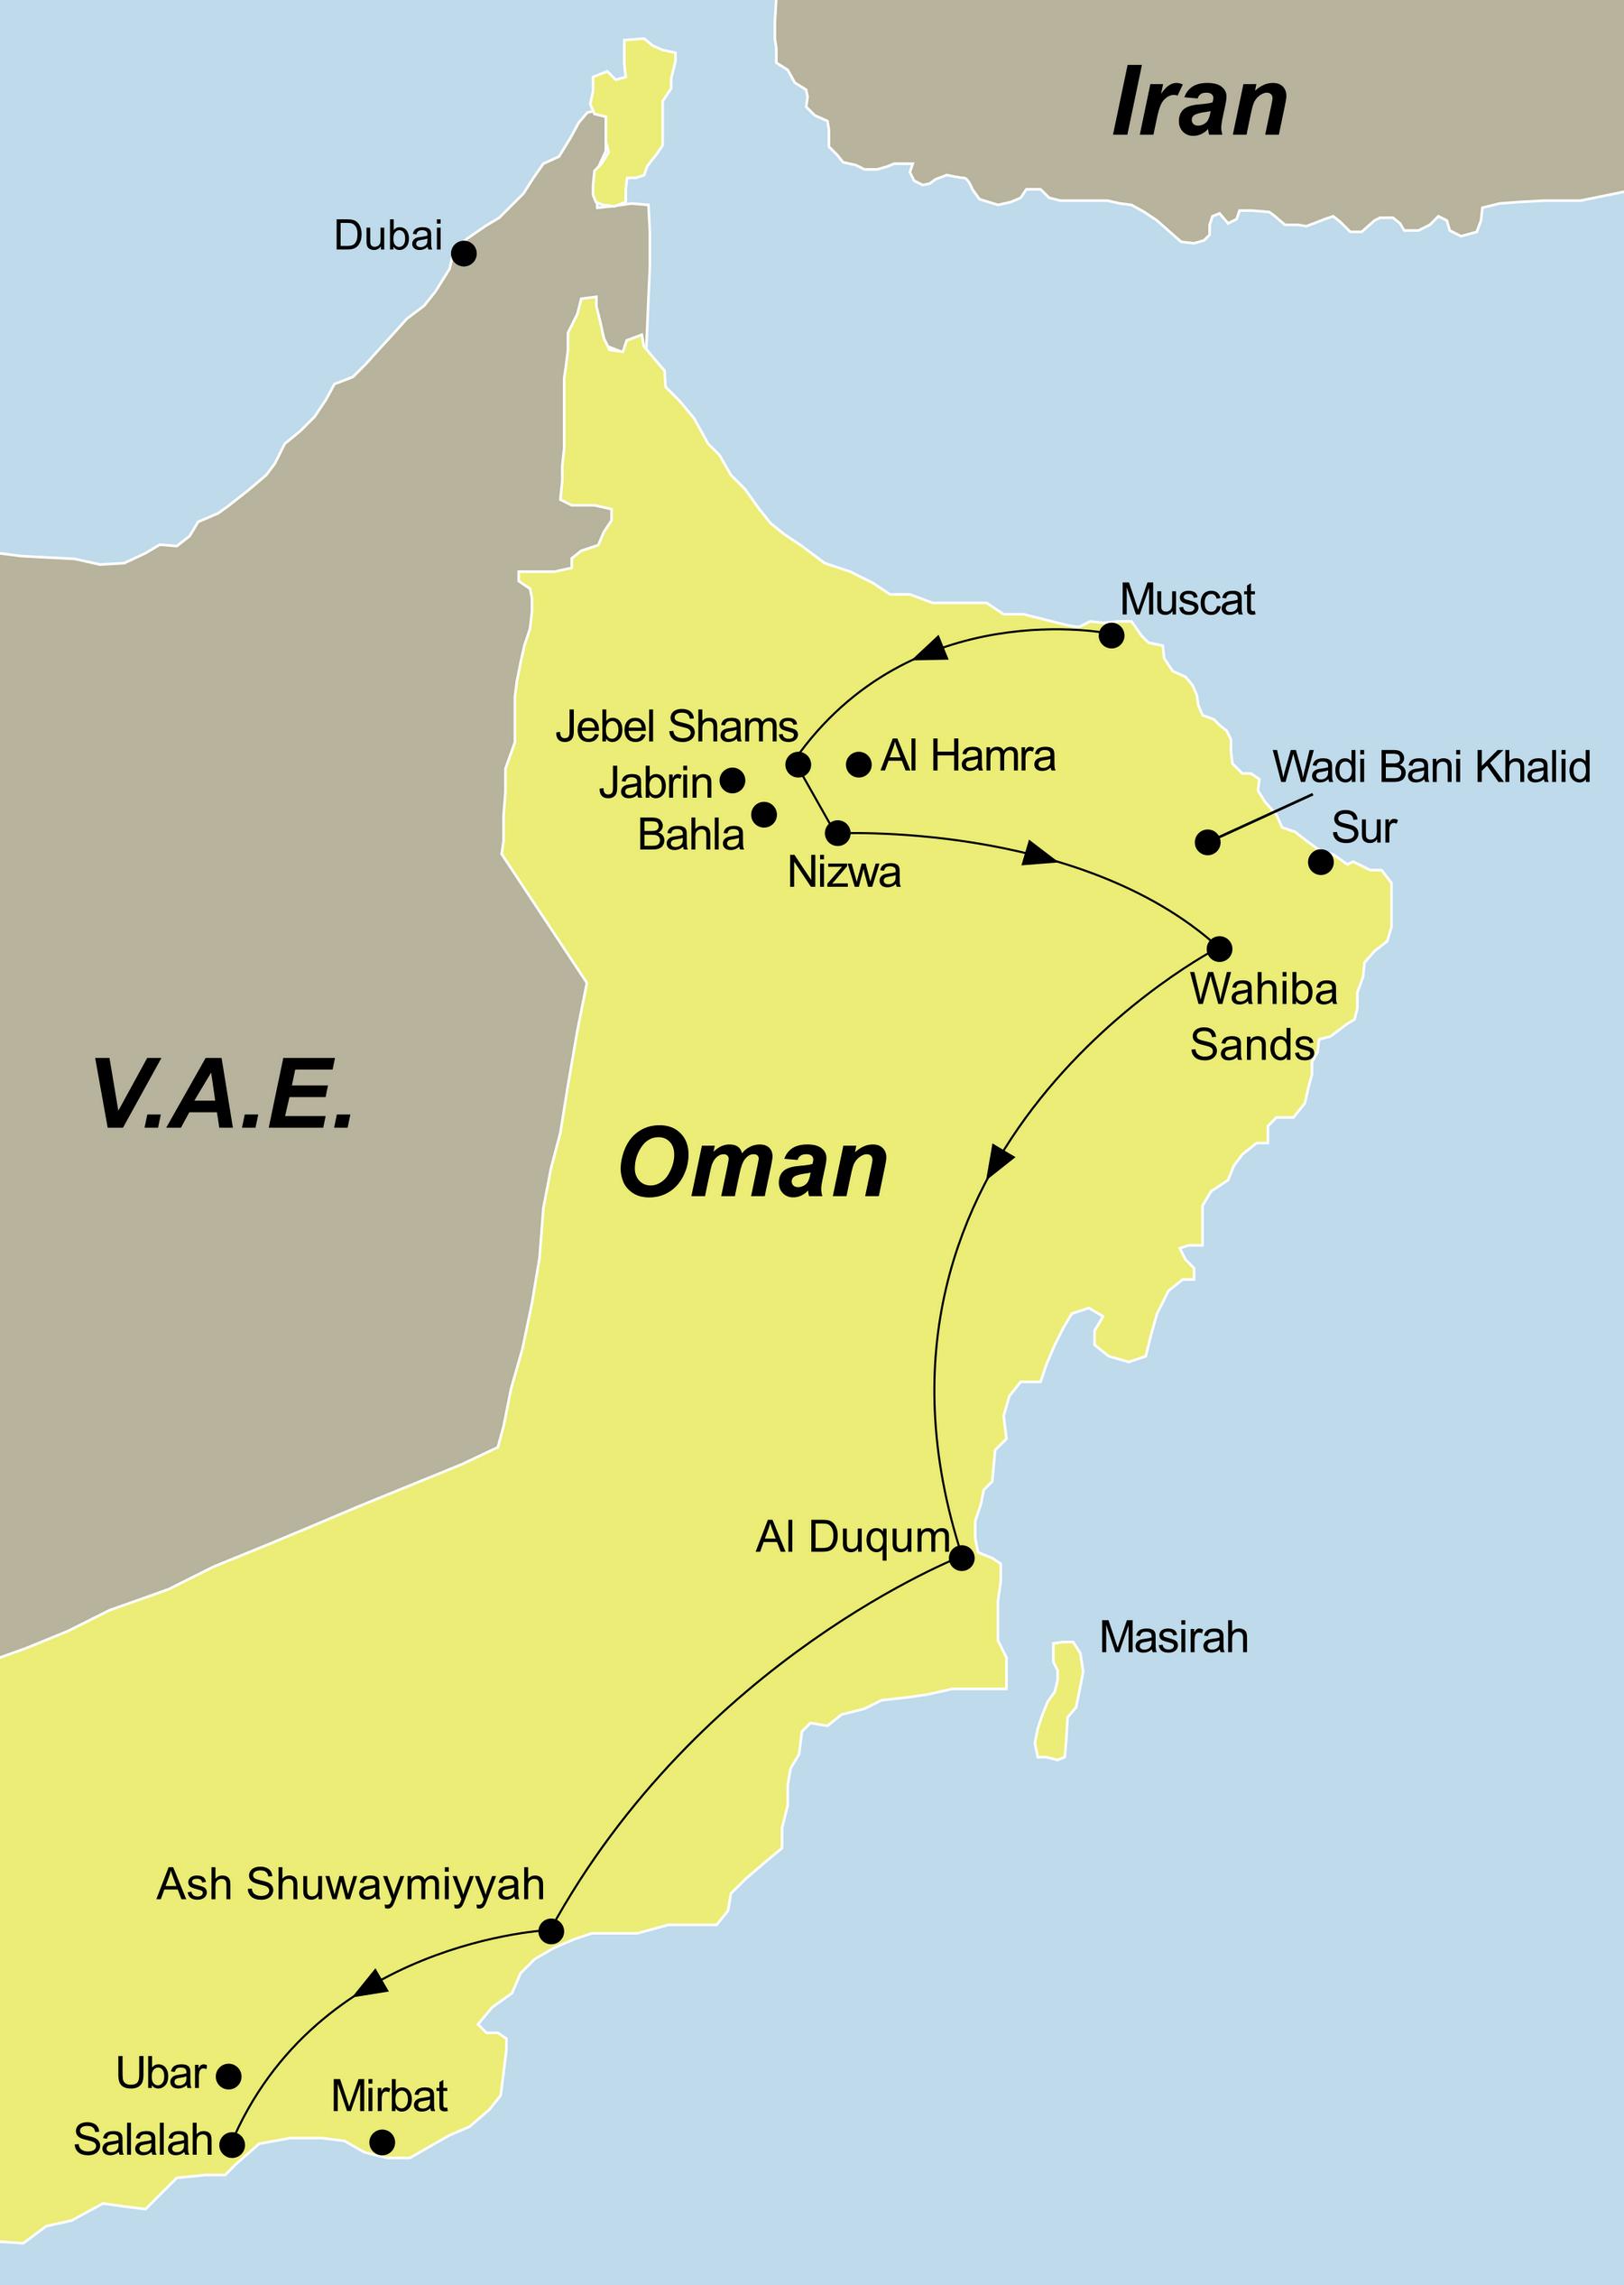 Karte Oman Kostenlos.Oman Mietwagen Selbstfahrer Rundreisen Oman Individuell